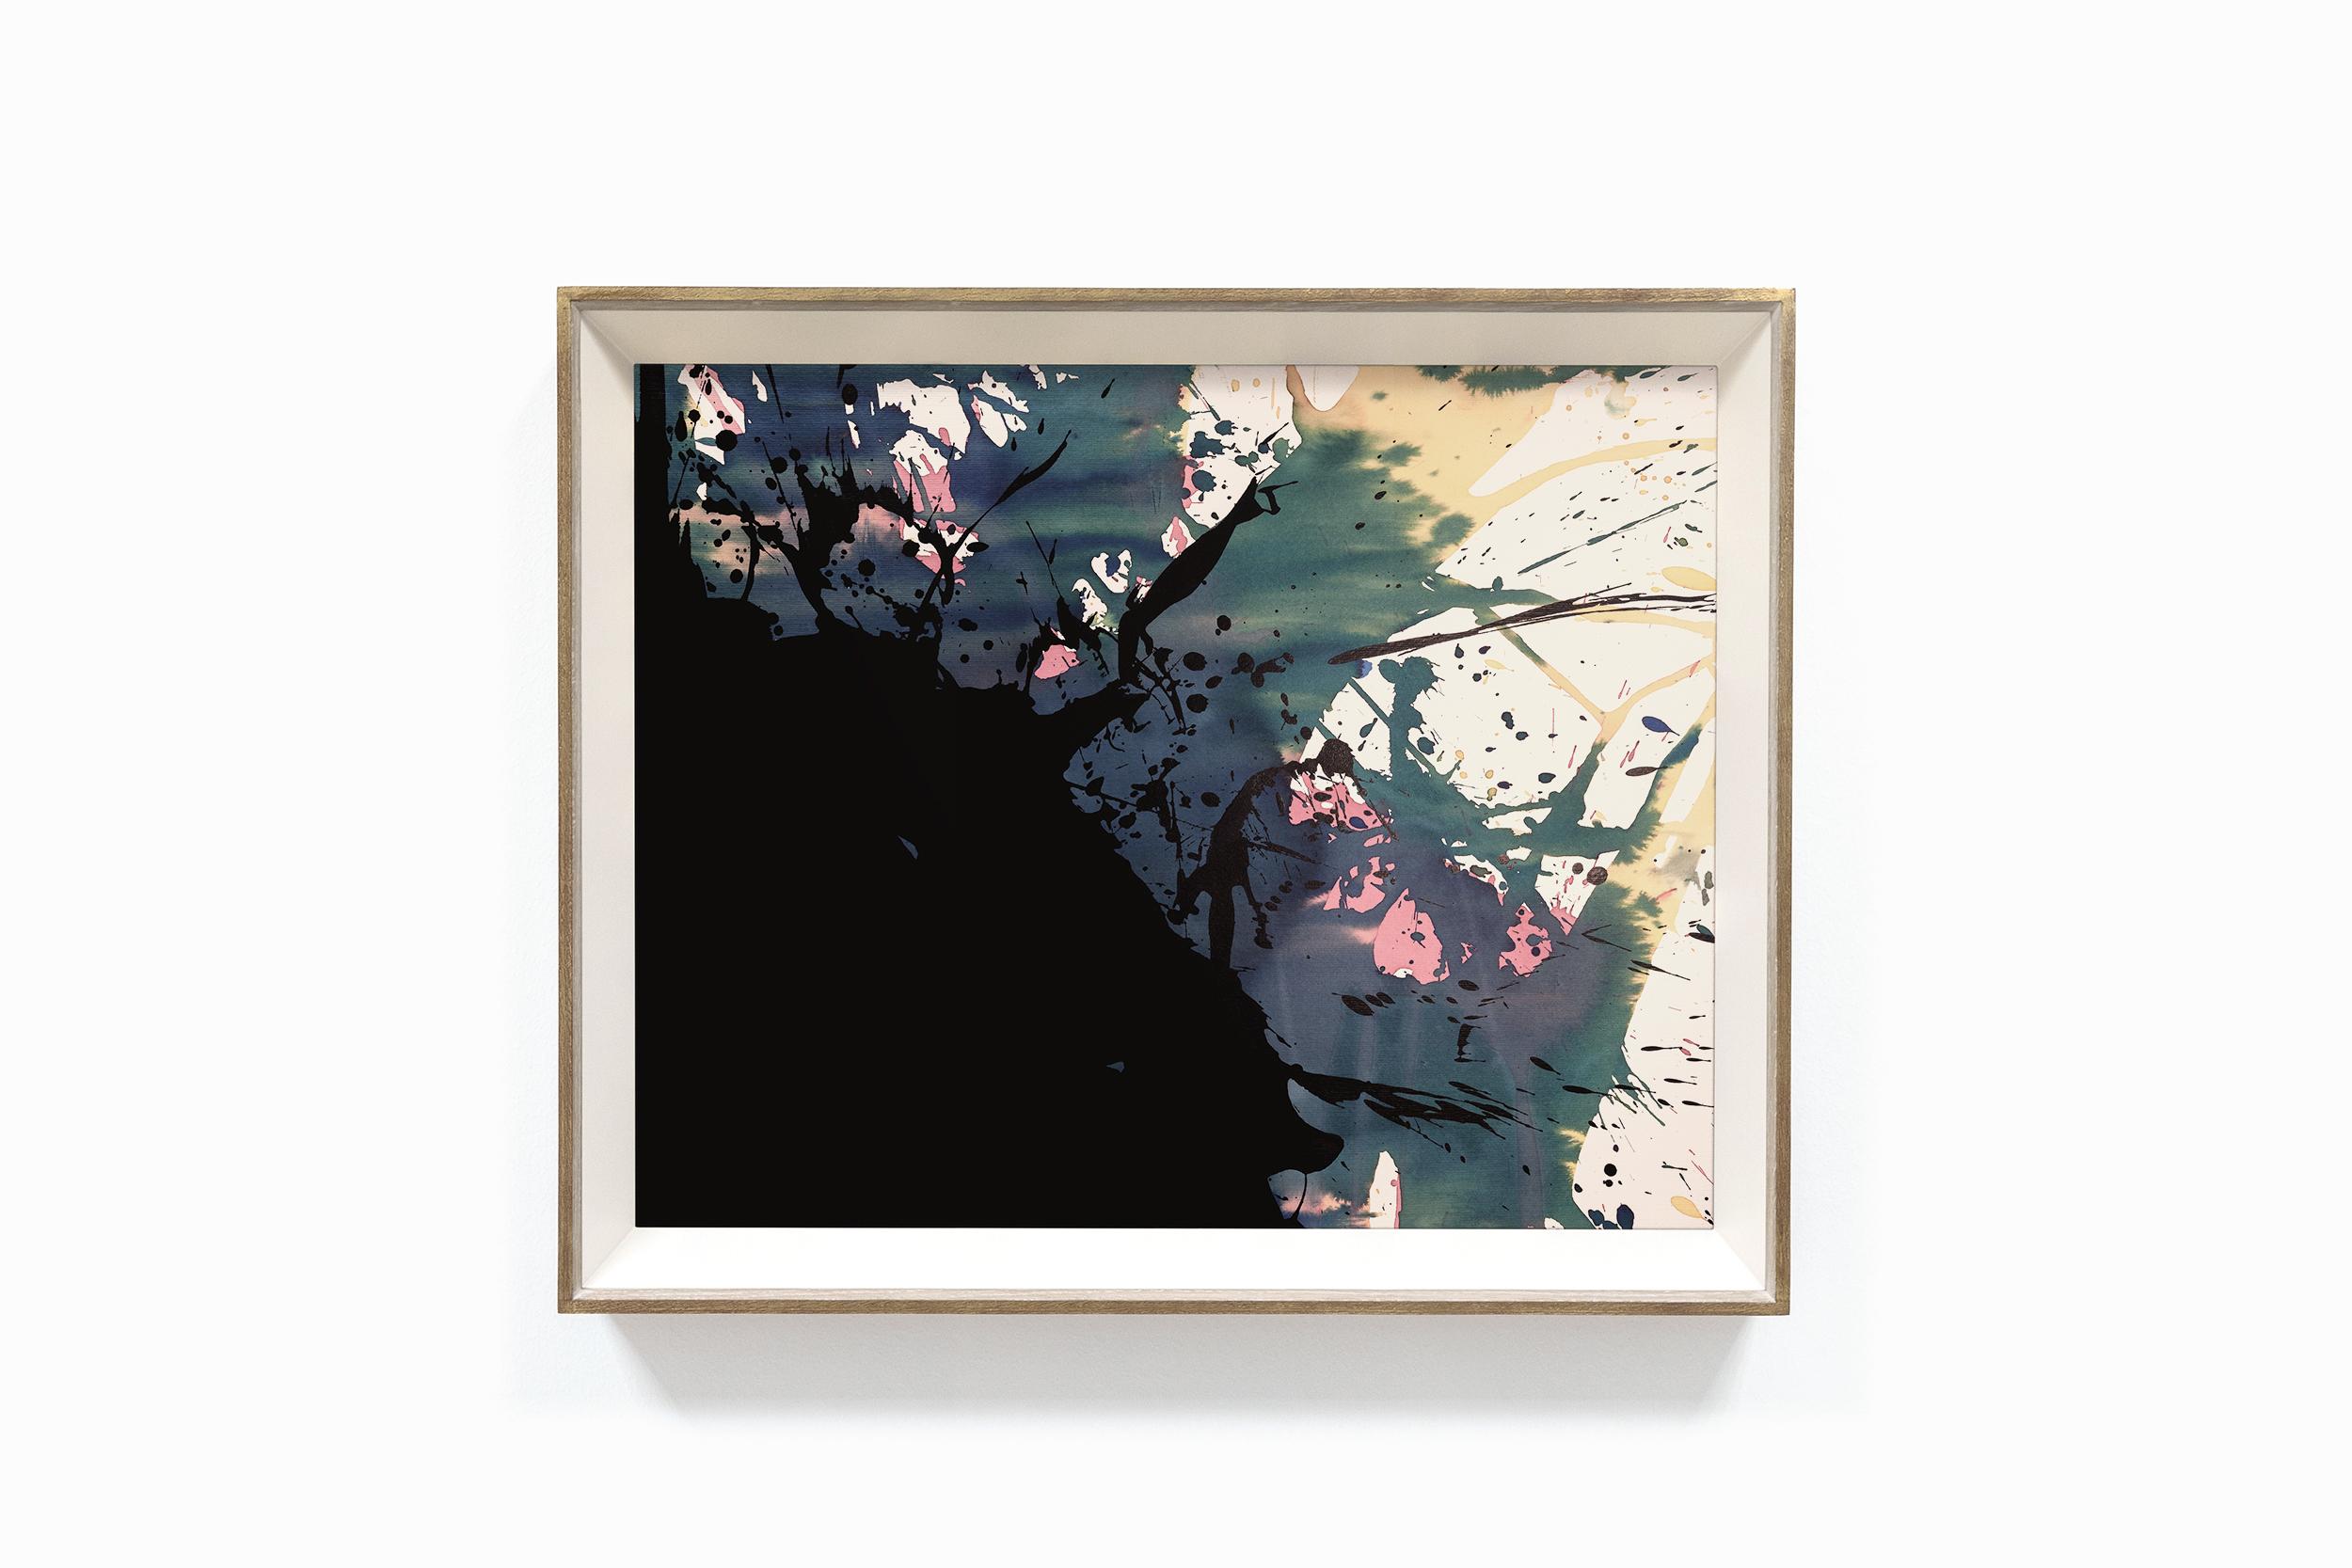 bonjourmolotov Superficial Illustration Ilustracao painting pintura acrylic acrílico canvas tela paper cardboard mdf Andre Gigante 07.jpg